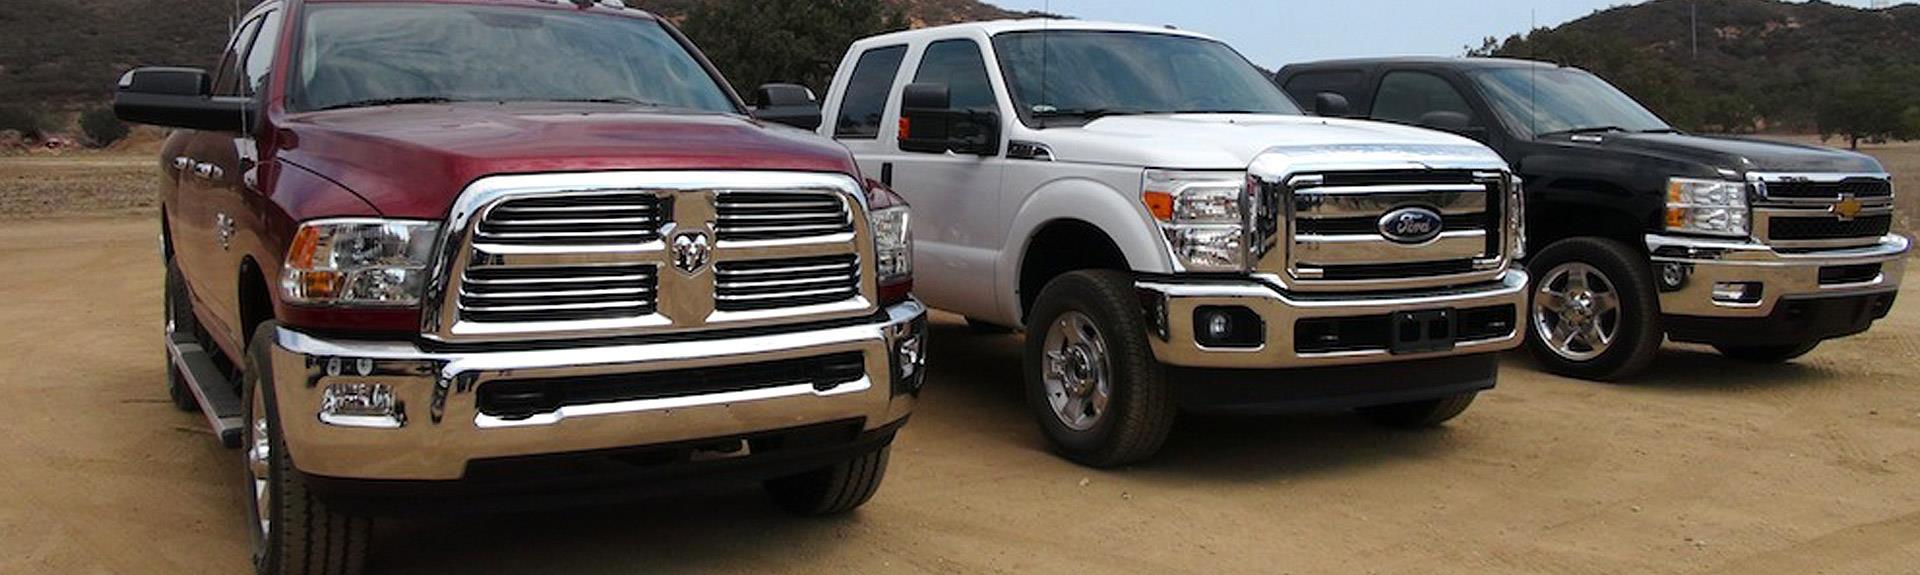 Shop By Make & Truckland Spokane WA   New u0026 Used Cars Trucks Sales u0026 Service